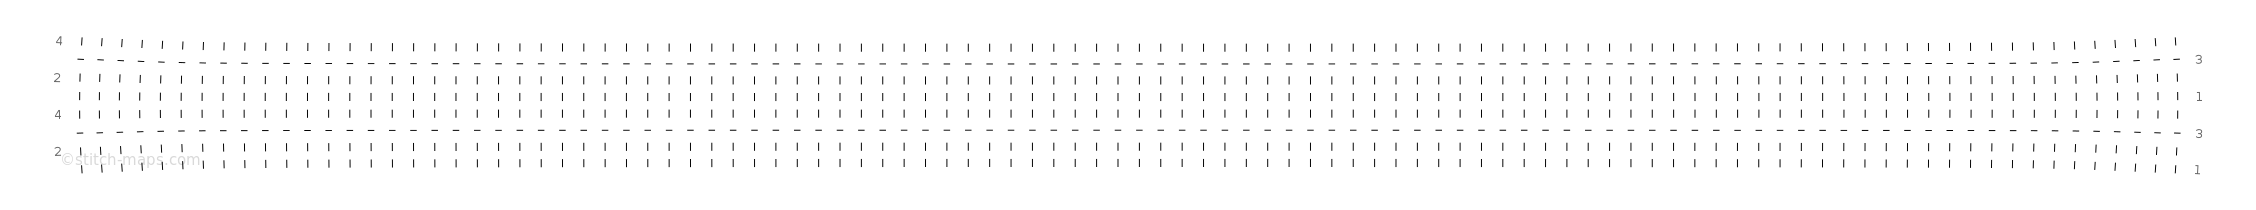 test chart